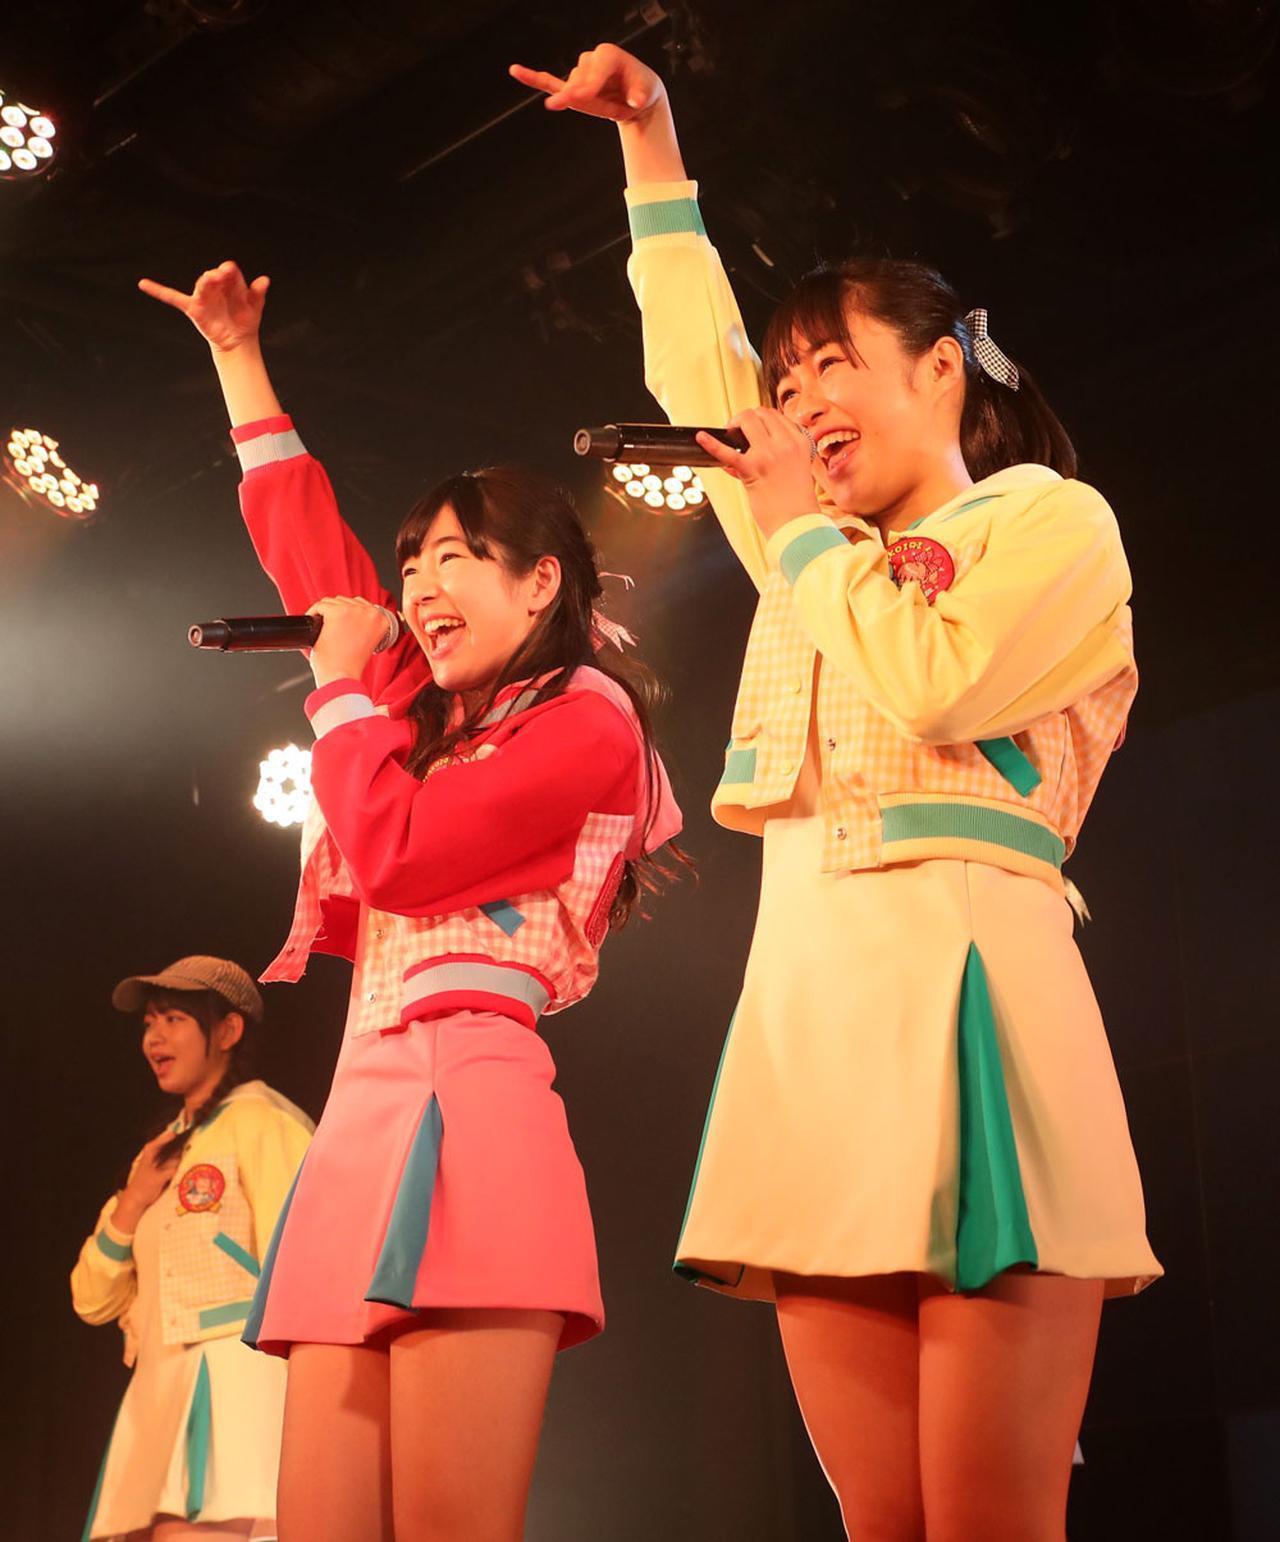 Images : 46番目の画像 - 「ハコイリムスメ/依田彩花、山本花奈を新メンバーに迎え、第5期発足。ロックンロール調の新オリジナル曲「キス取りゲーム」も披露」のアルバム - Stereo Sound ONLINE